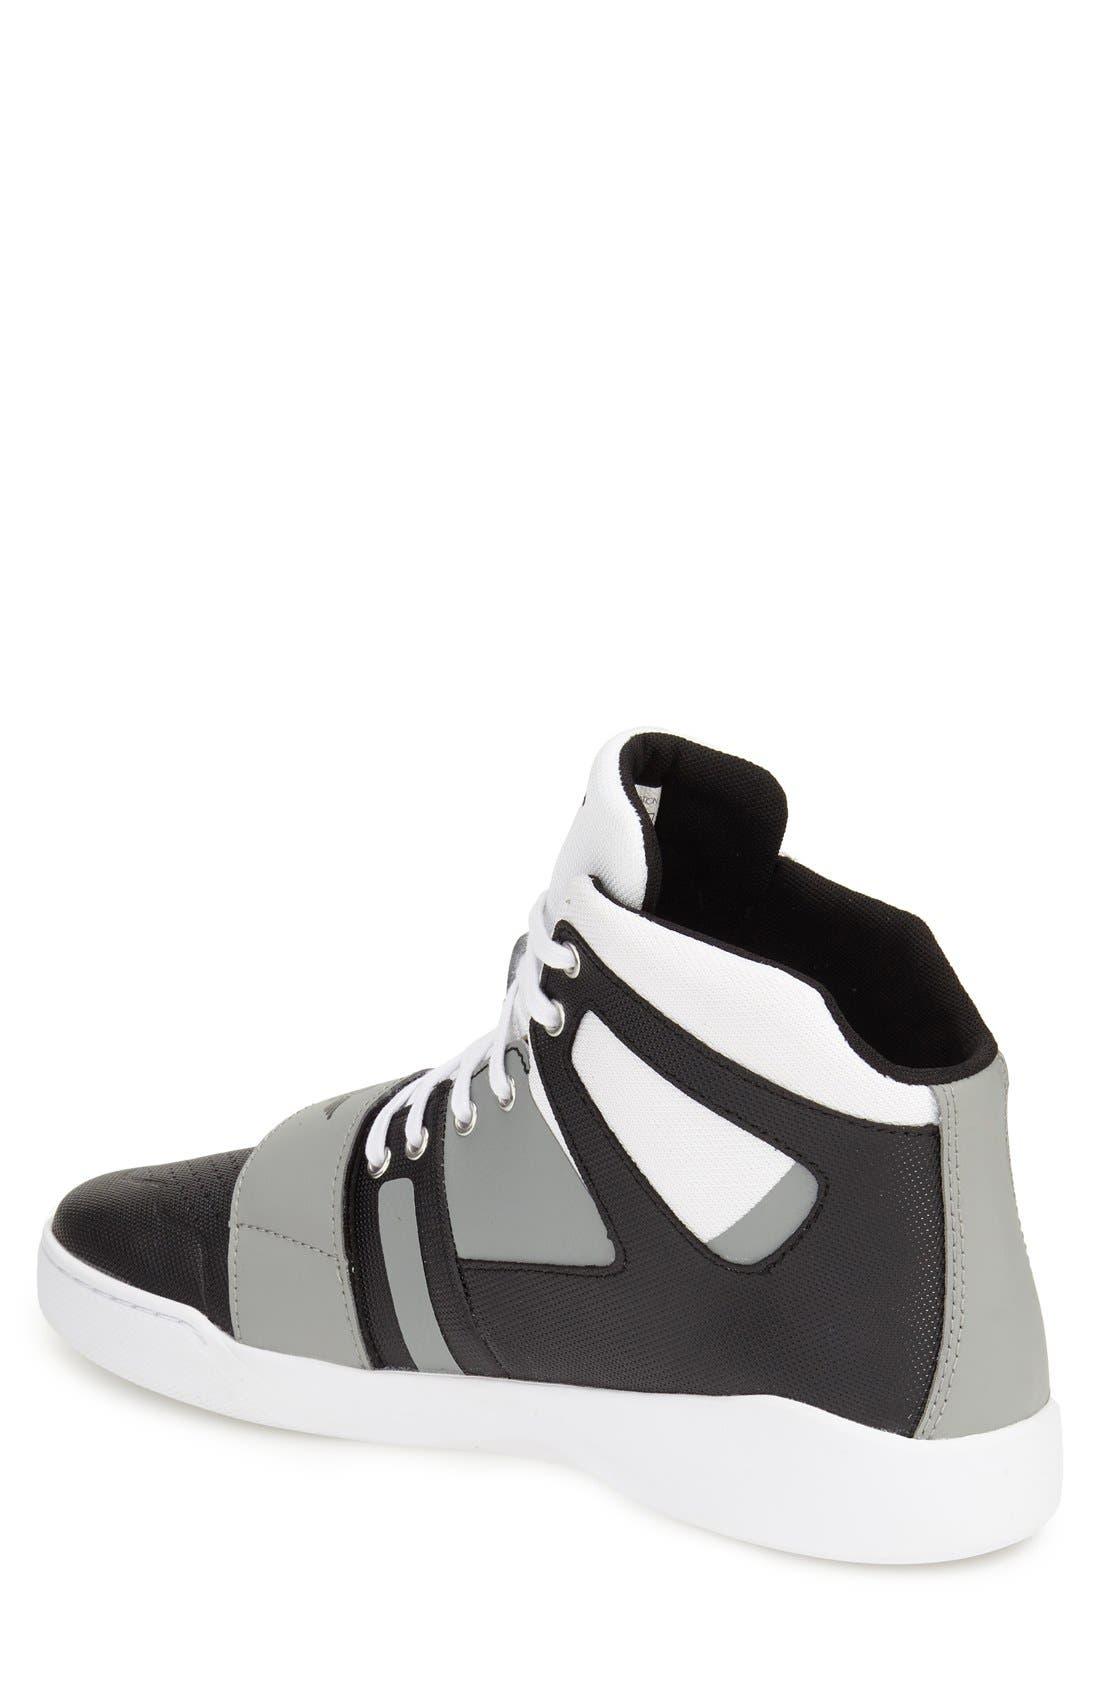 Alternate Image 2  - Creative Recreation 'Manzo' Sneaker (Men)